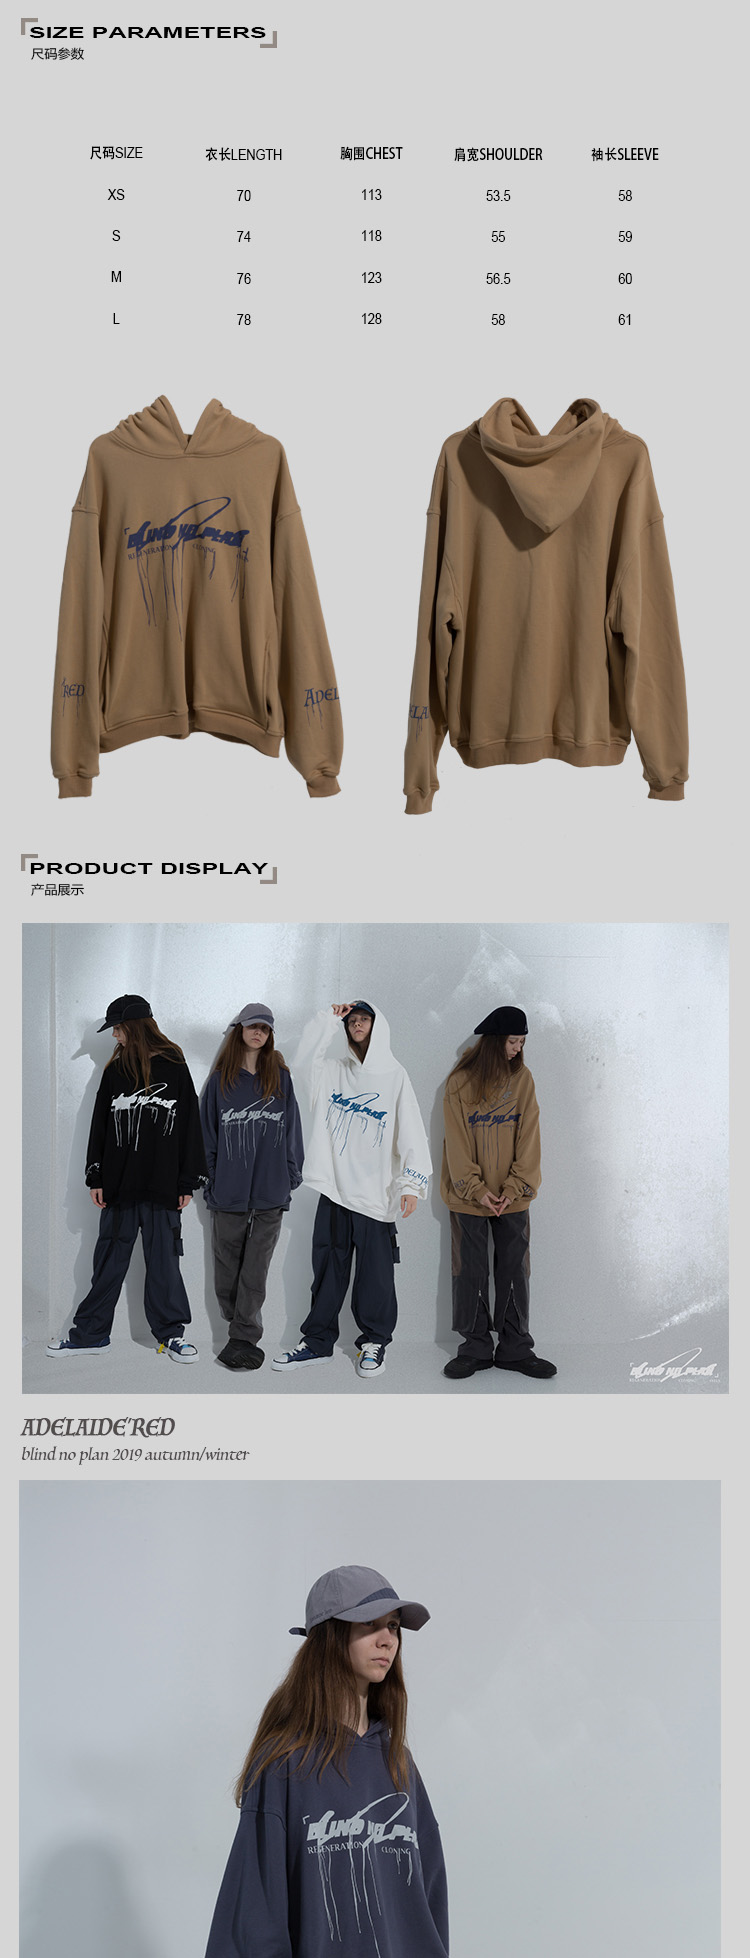 Stock Apparel Girls Split Top Cotton Unisex Baggy Basic Hoodys Mens Gym Hip Hop Custom Printing Xxxxl Jumper Women Hoodies